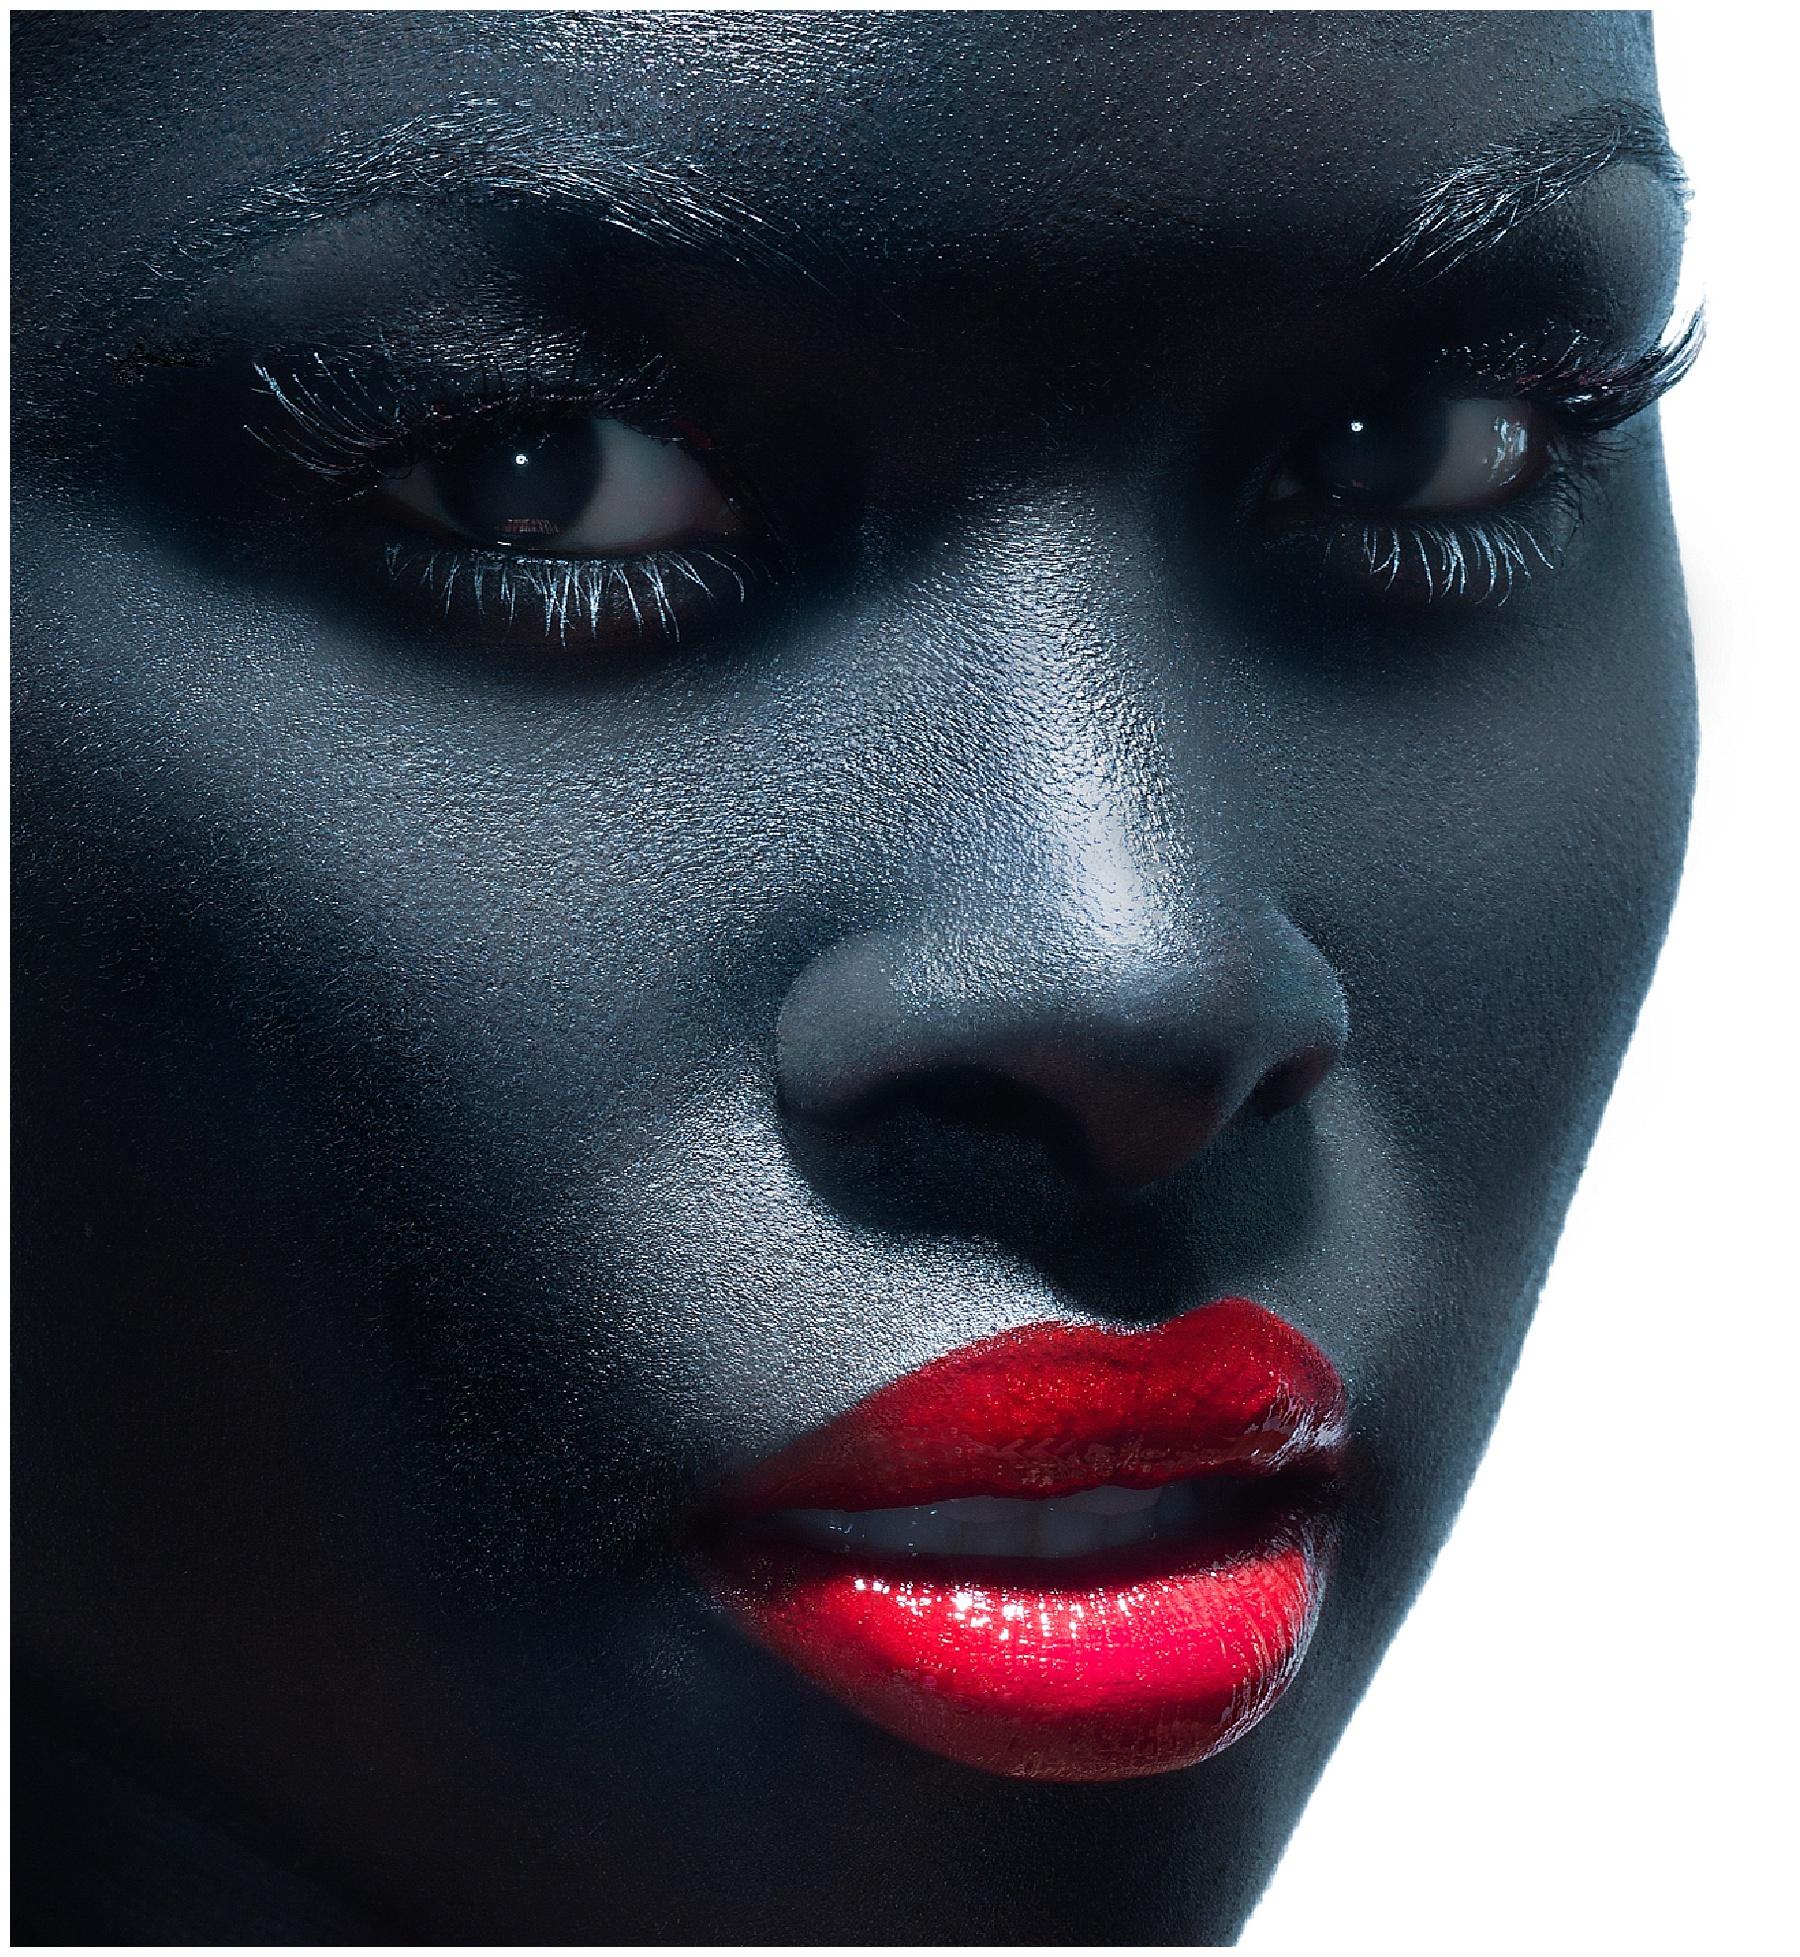 DerekBlanks_Beauty_025.jpg